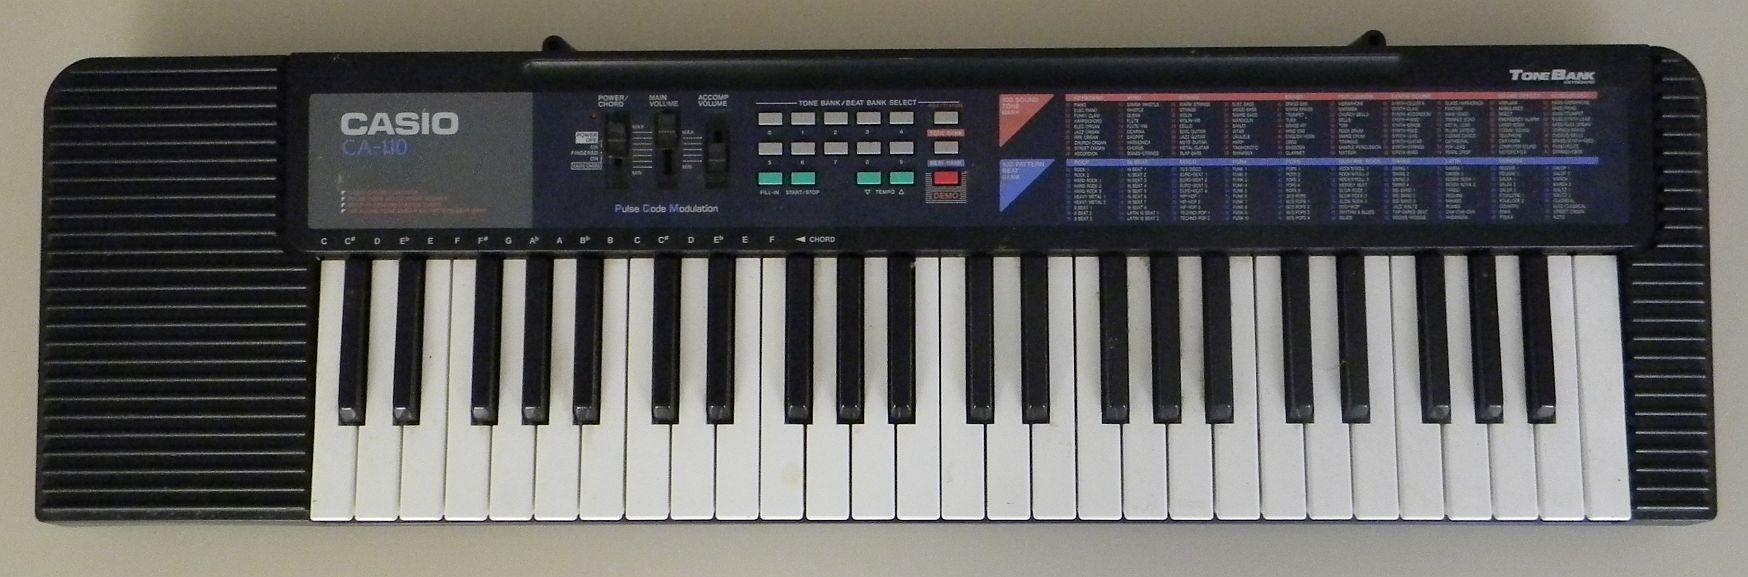 casio keyboard ca 110